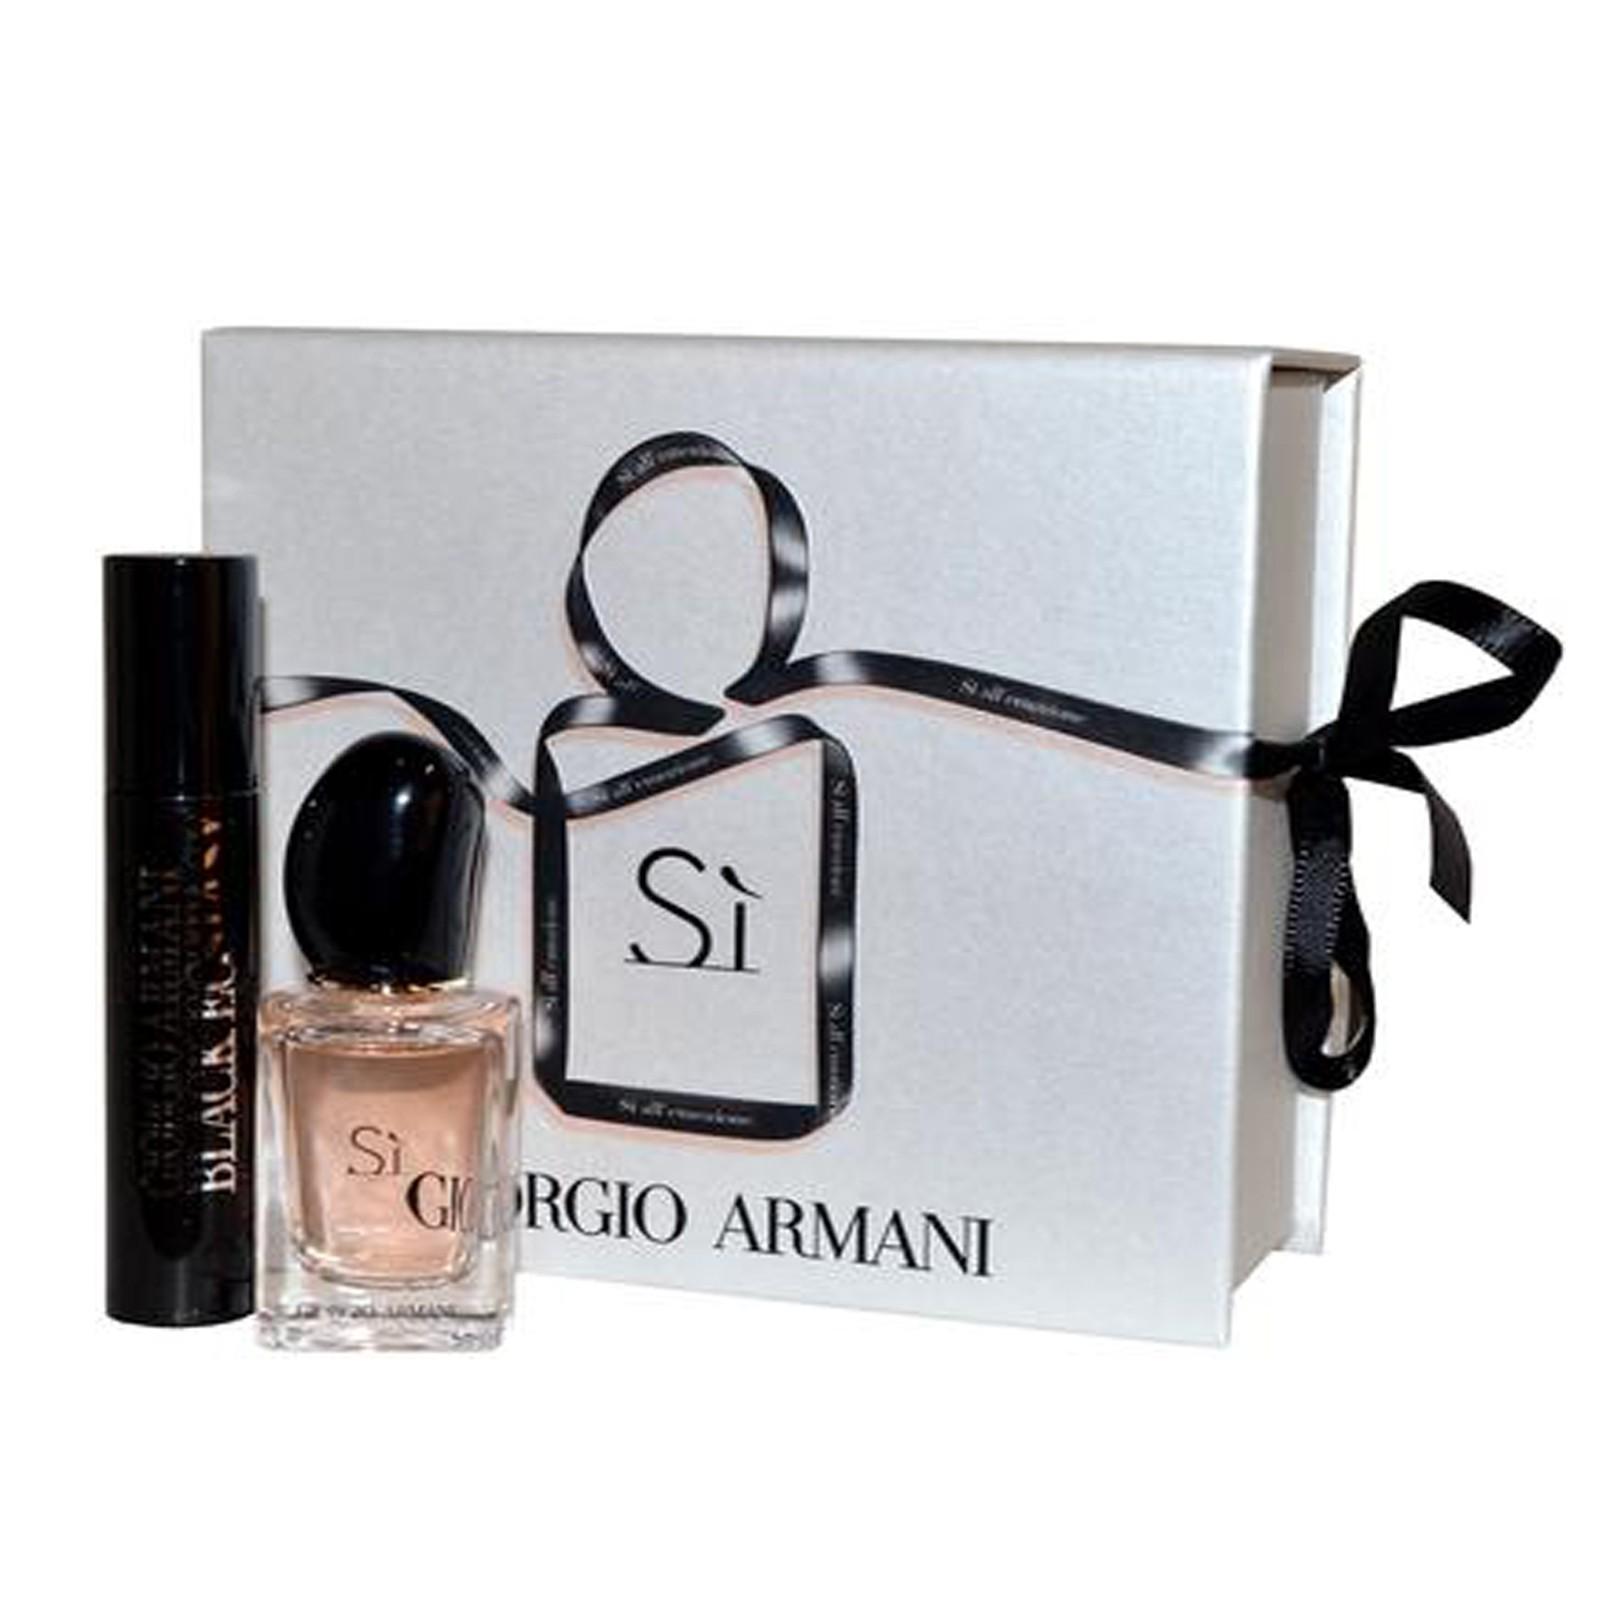 Giorgio Armani Si Parfum & Total Effect Black Mascara Gift Set